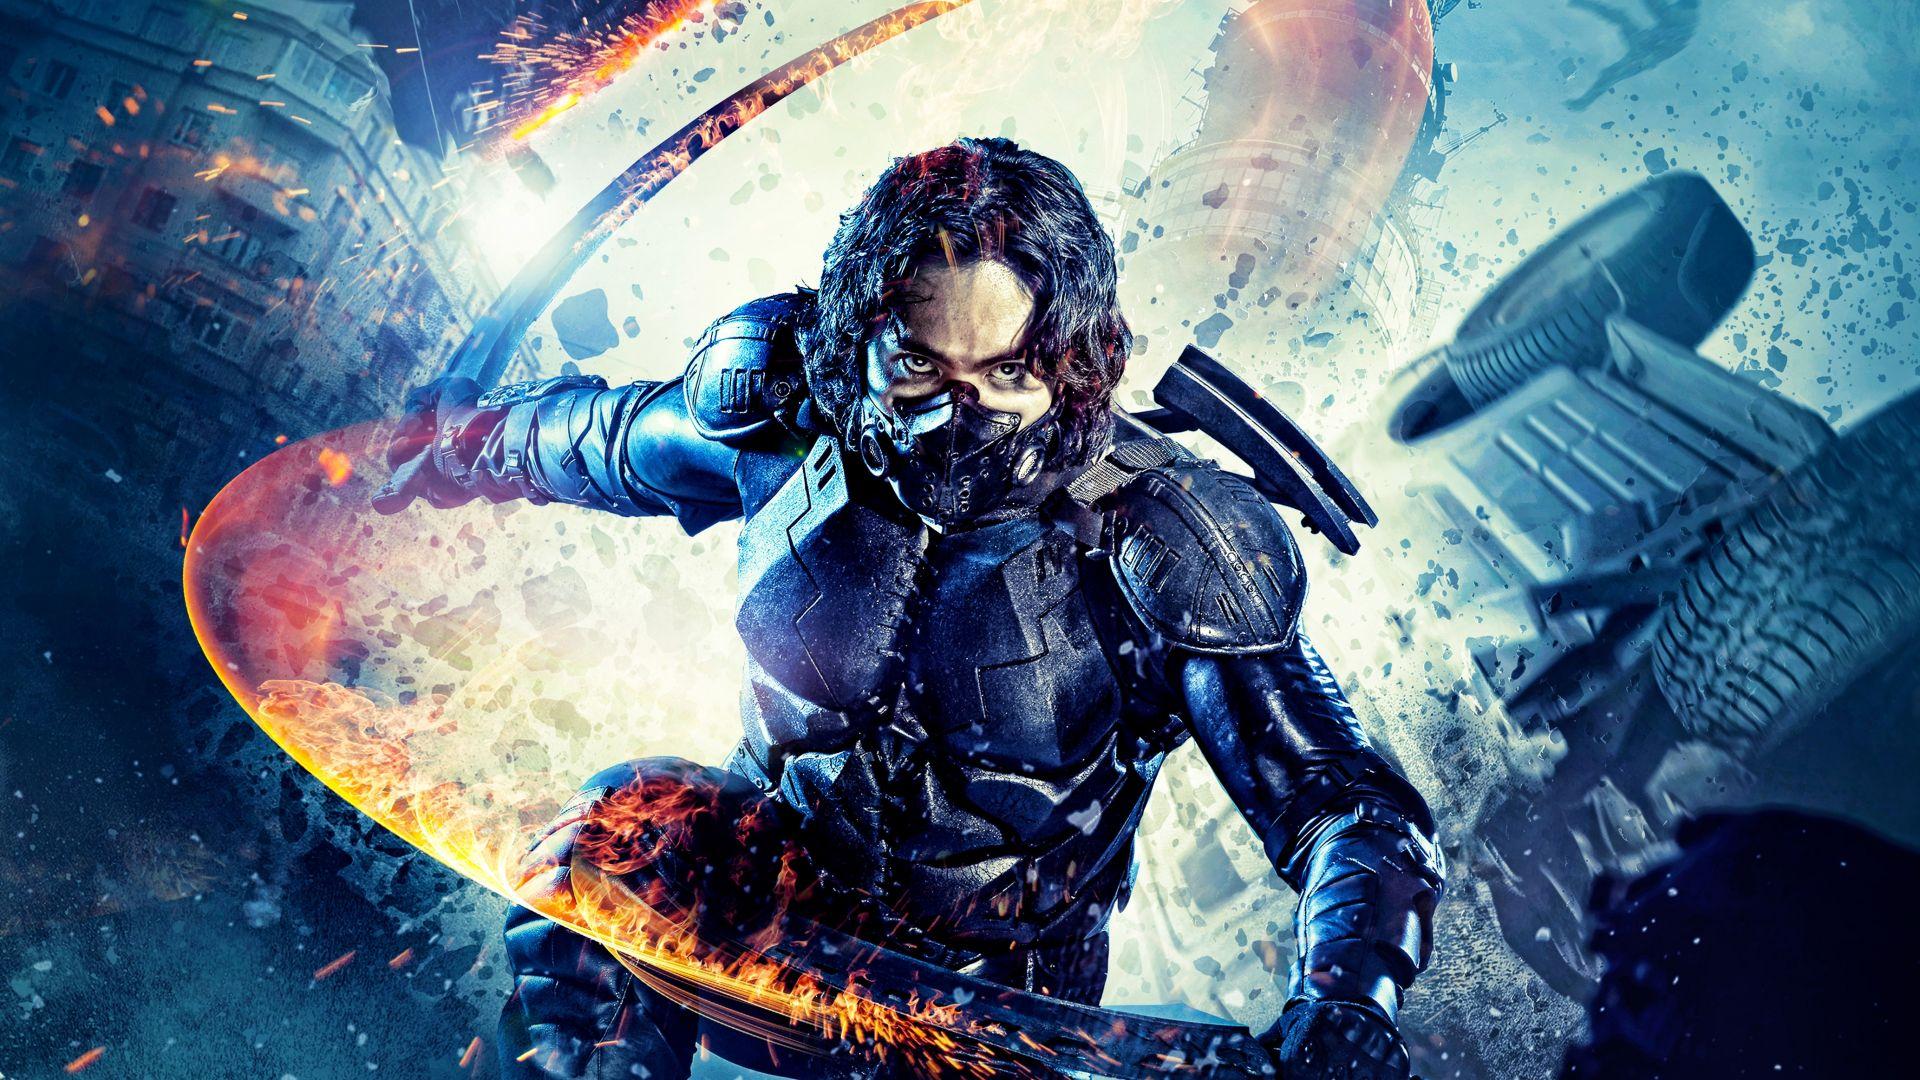 Wallpaper The Guardians, Superhero, Best Movies, Movies #10790